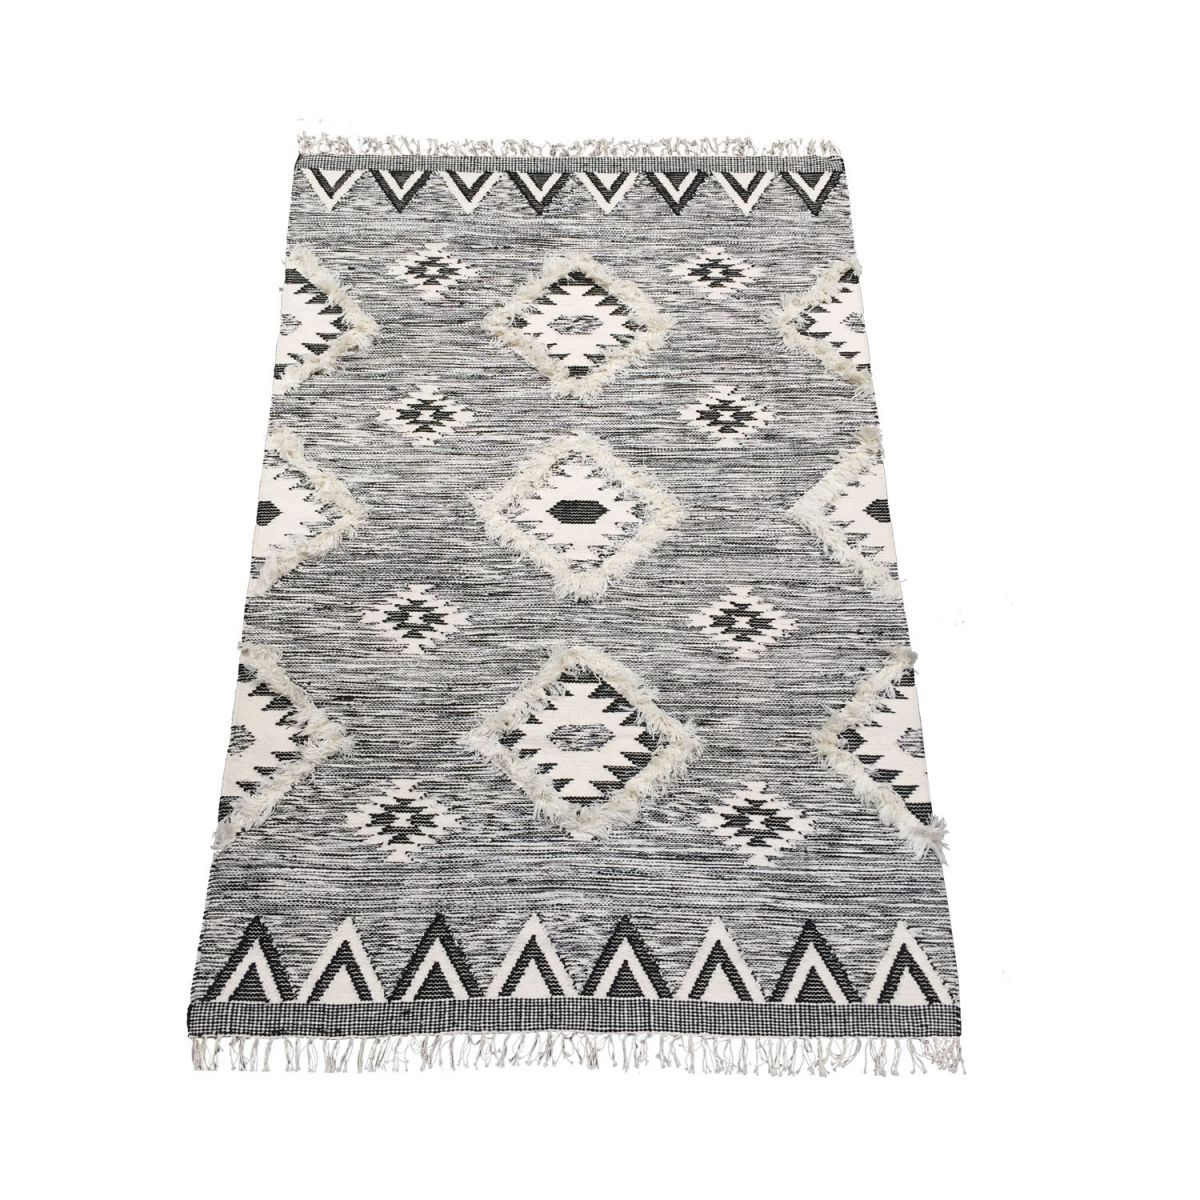 rug wool woven graphic design black white 250x350cm